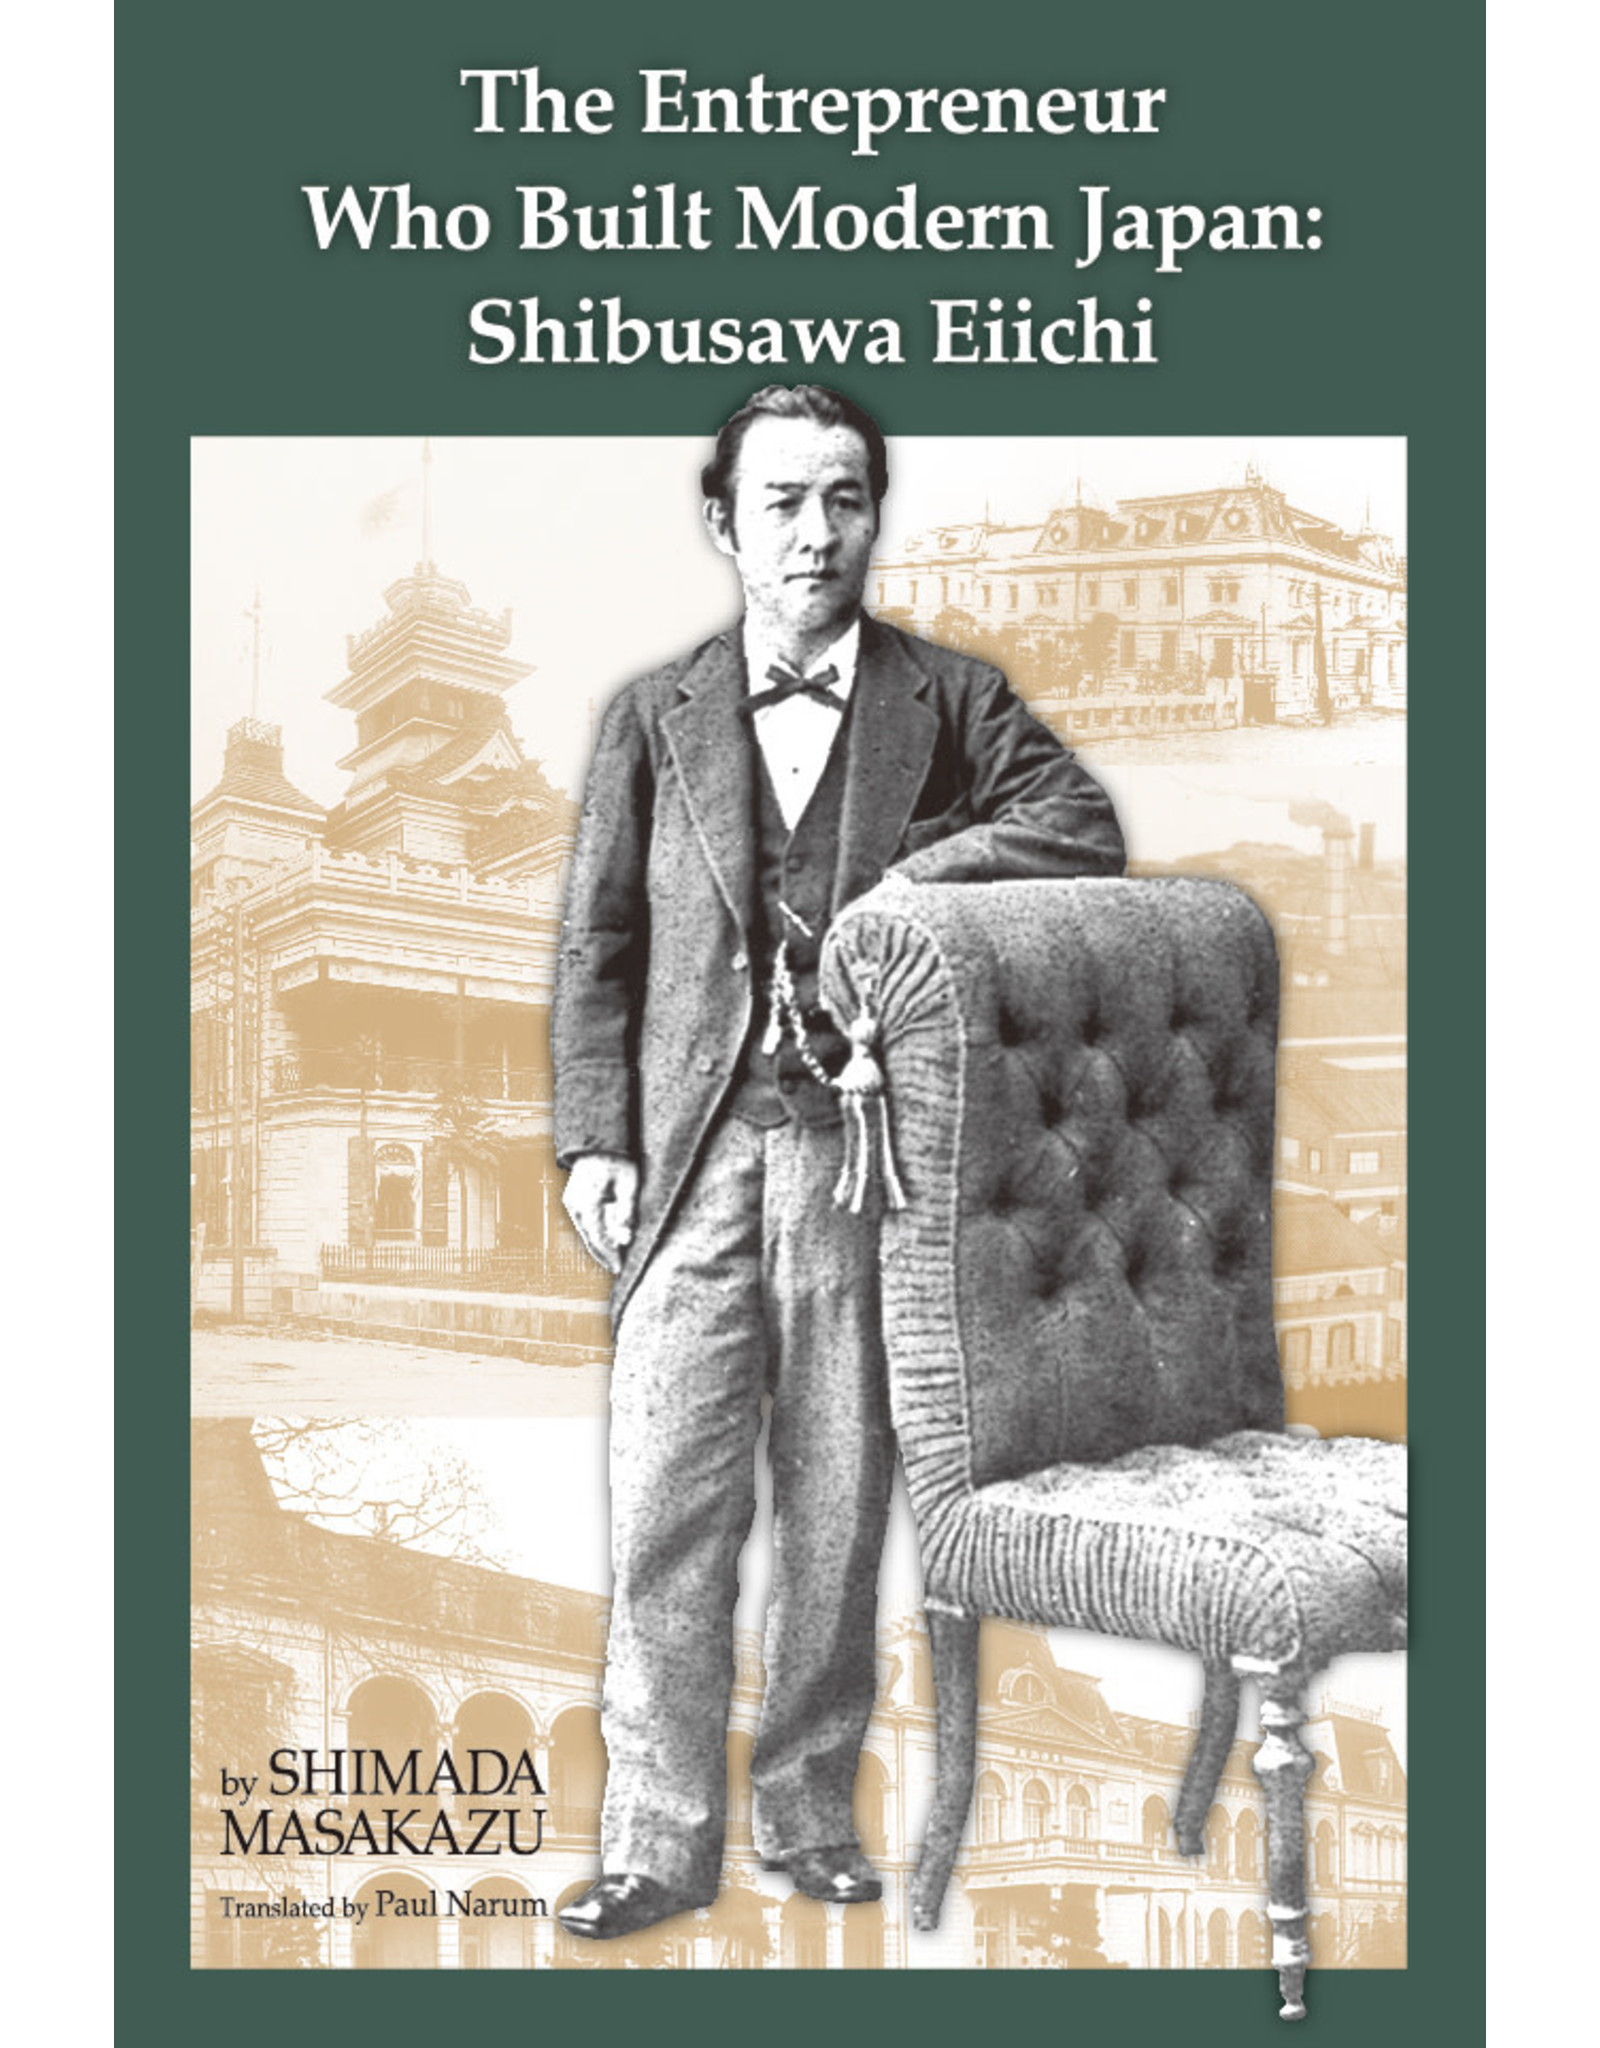 JPIC The Entrepreneur Who Built Modern Japan: Shibusawa Eiichi